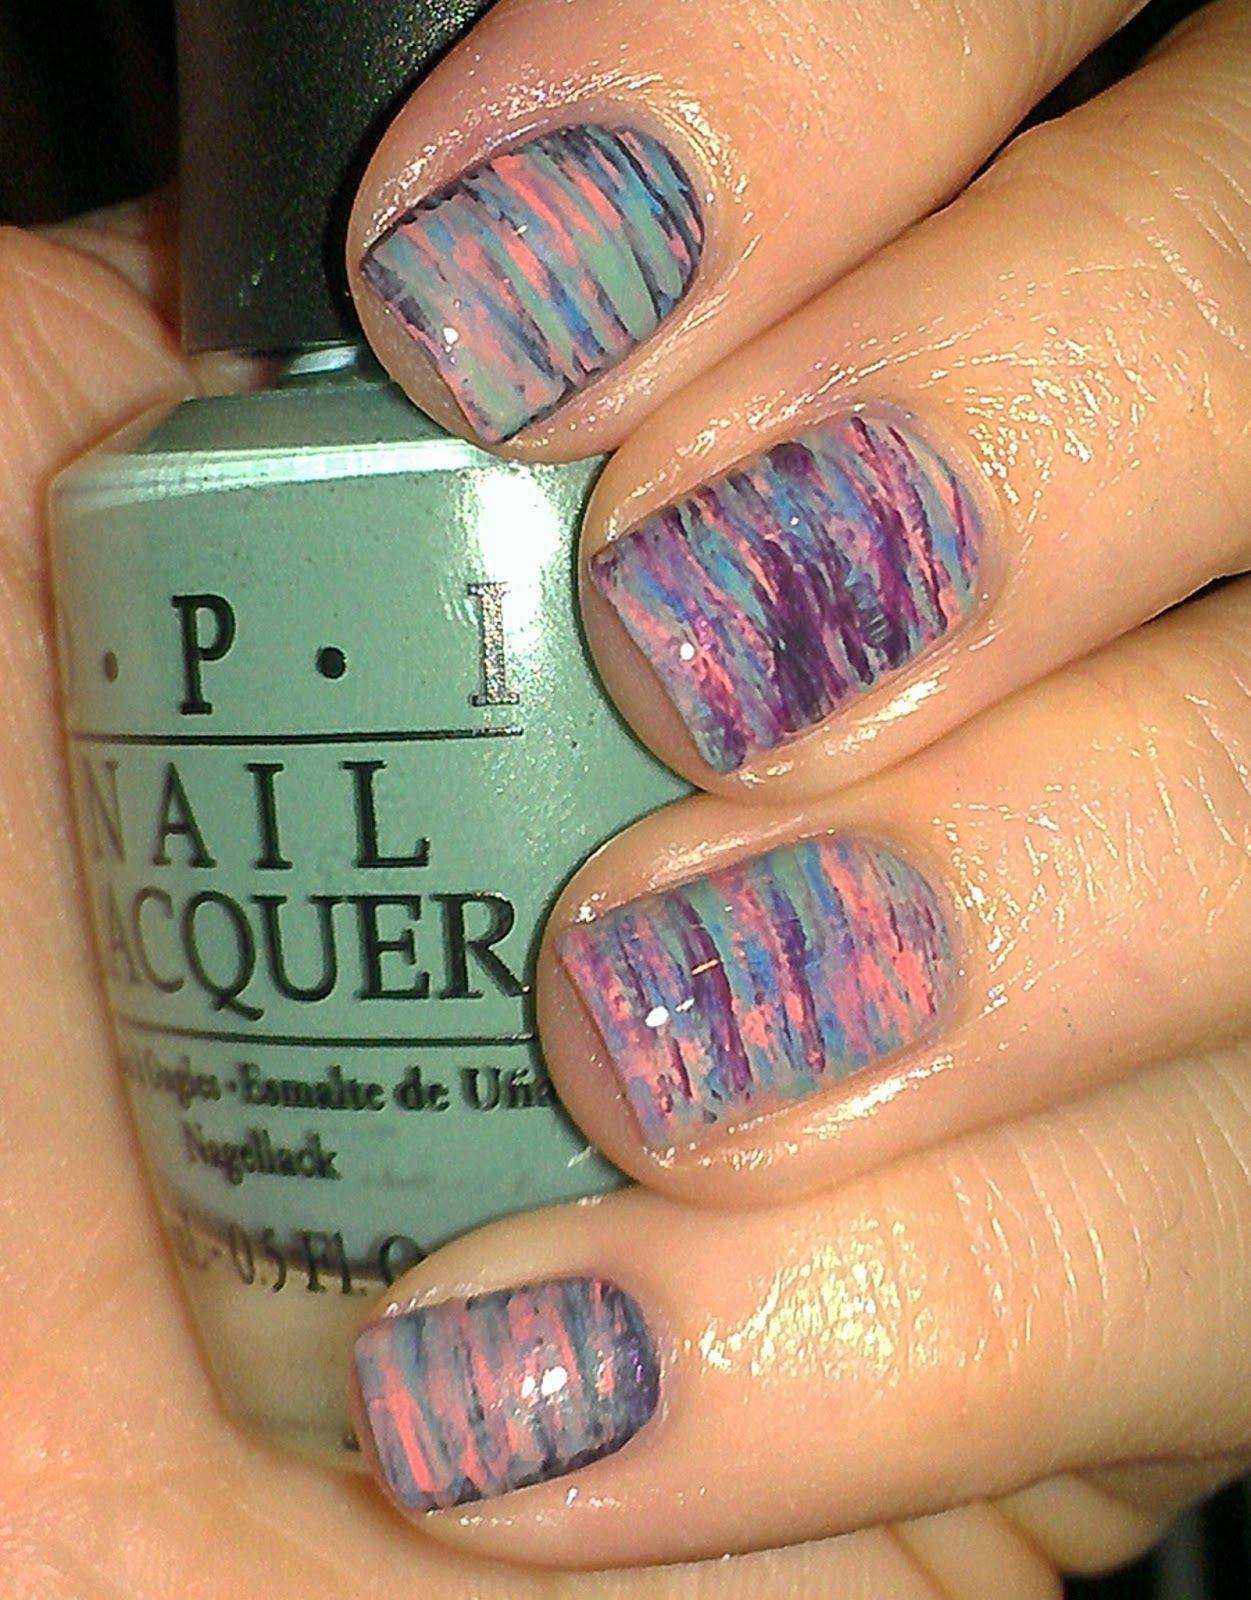 fan brush nail design | Nail Art | Pinterest | Fan brush nails and ...